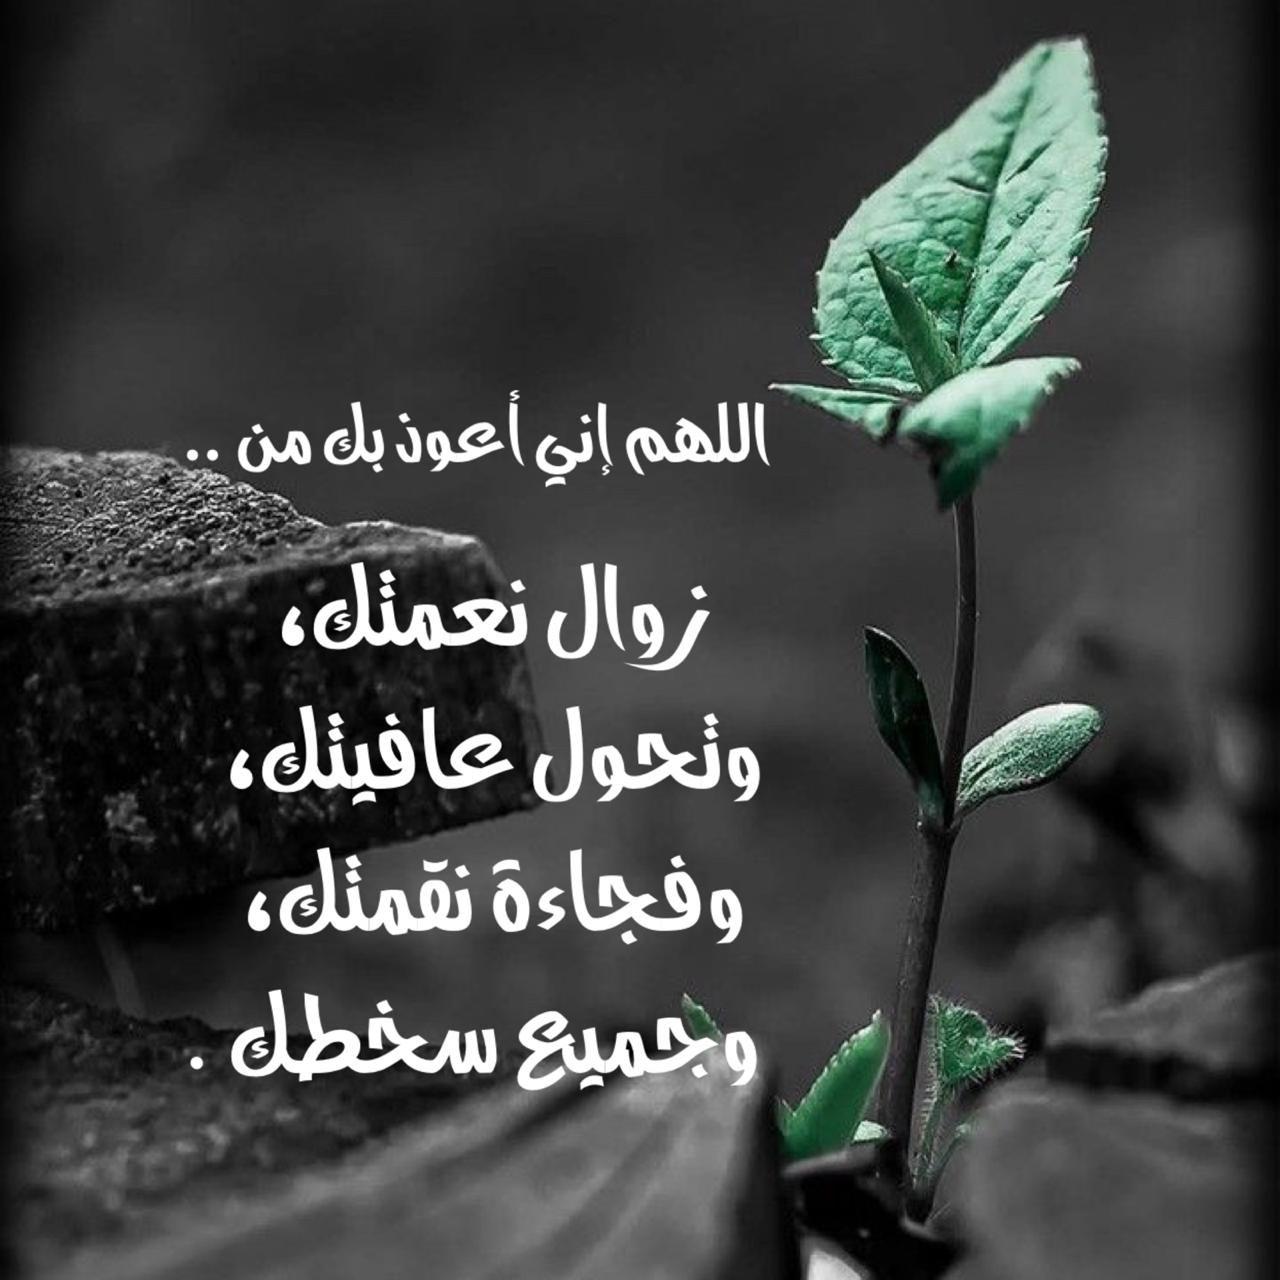 Pin By أدعية وأذكار On الدعاء Plant Leaves Islamic Prayer Plants